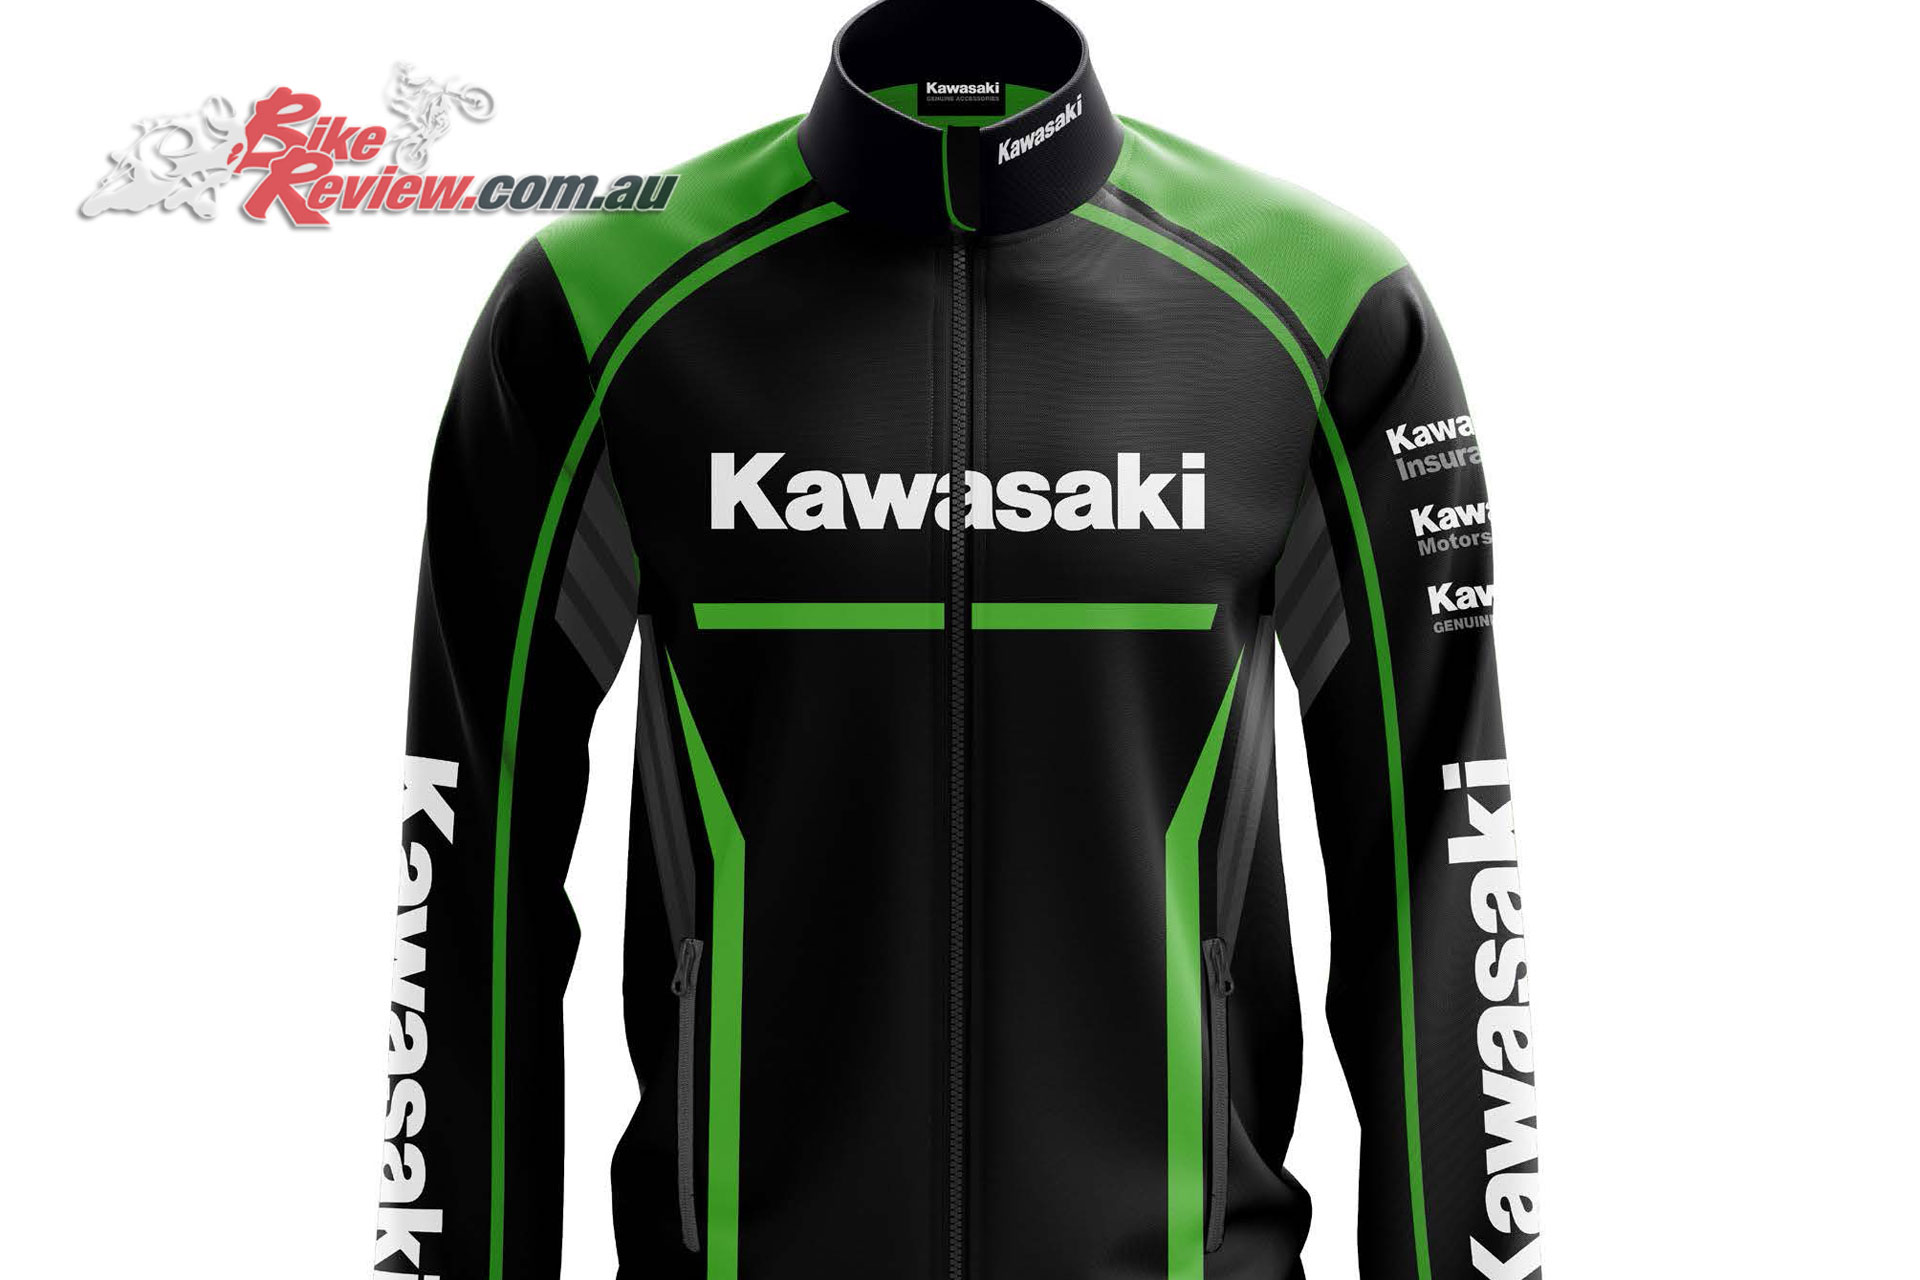 Kawasaki Motocross Team